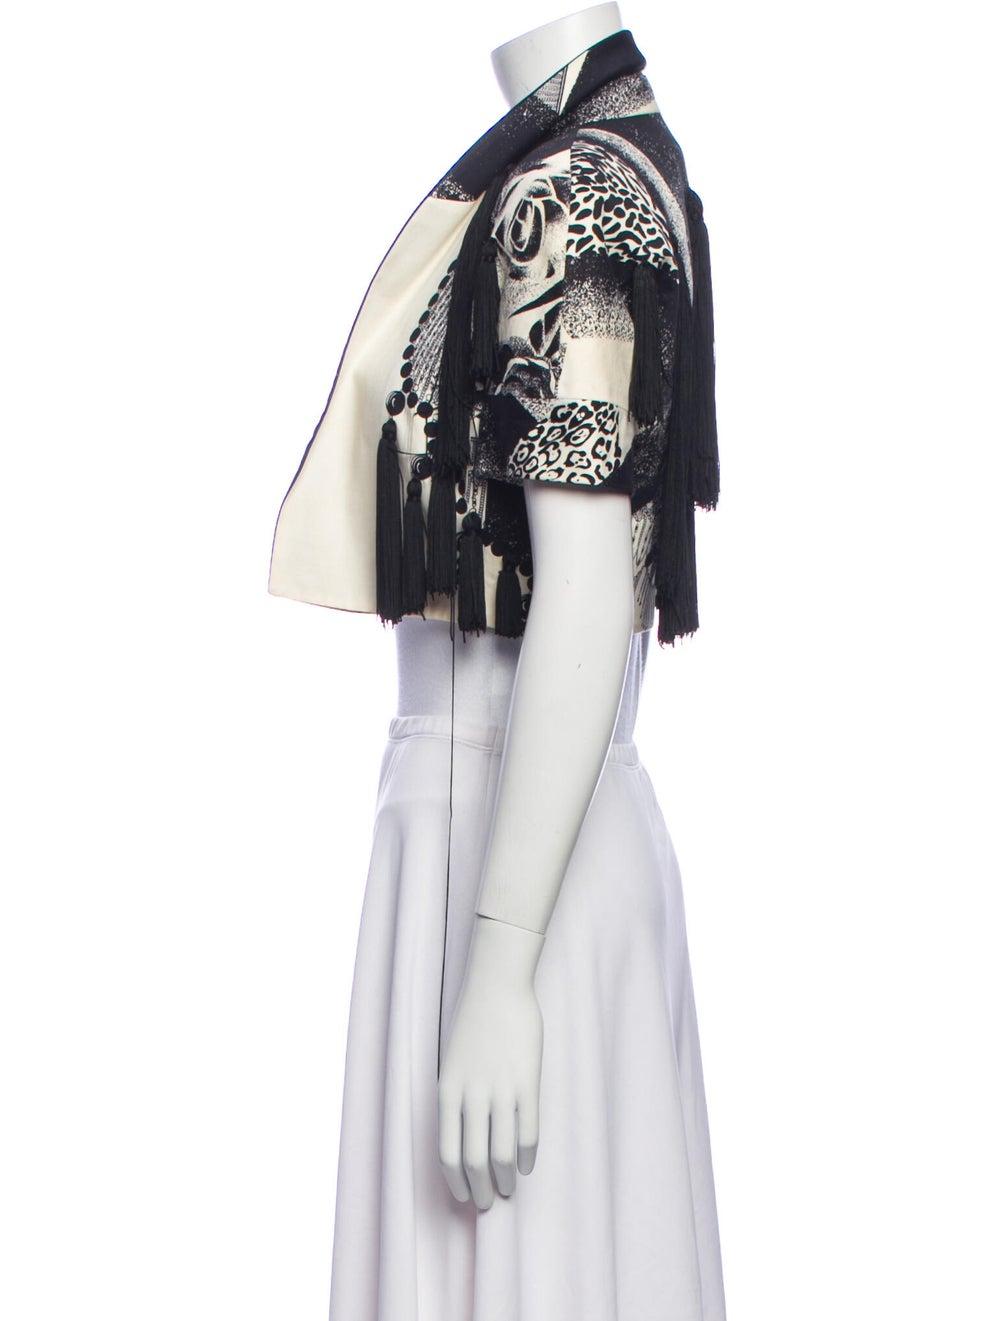 Gianni Versace Vintage 1990 Bolero - image 2